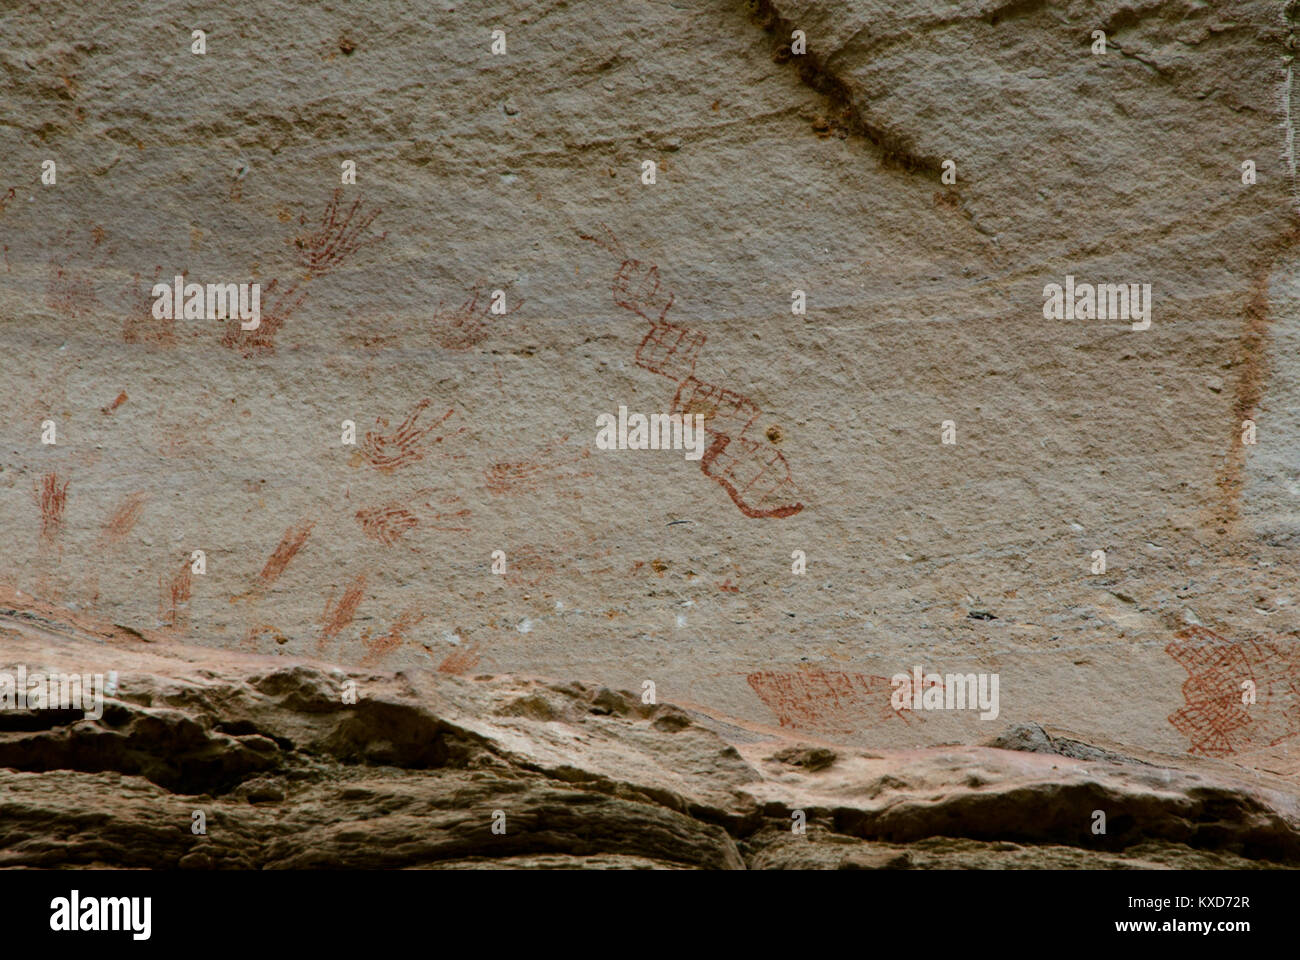 Prehistoric art paintings at cliff of Pha Taem, Ubon Rajchathani, Thailand - Stock Image